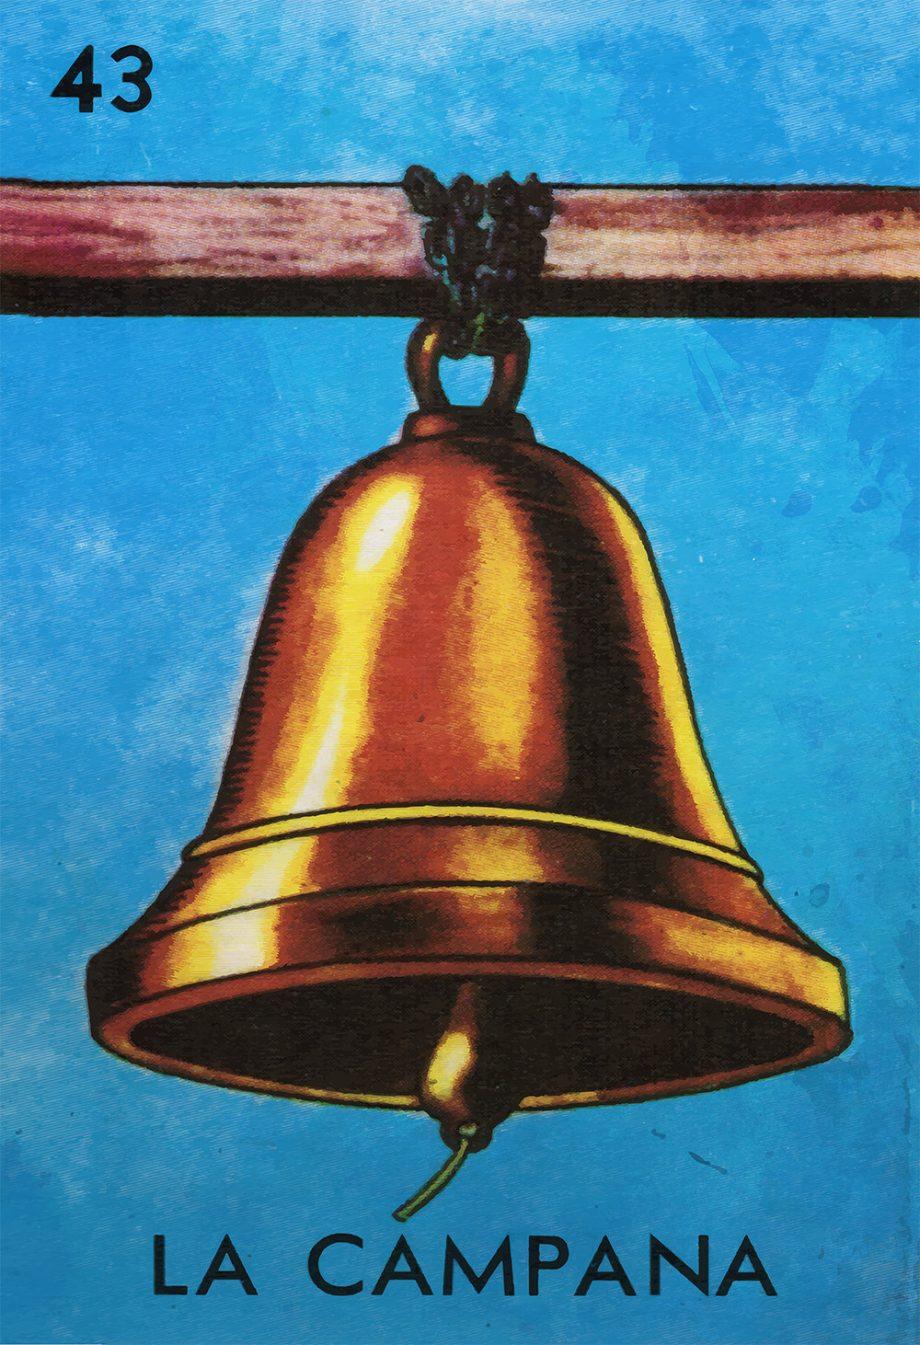 Loteria La Campana Mexican Retro Illustration Art Print Vintage Giclee on Cotton Canvas or Paper Canvas Poster Wall Decor